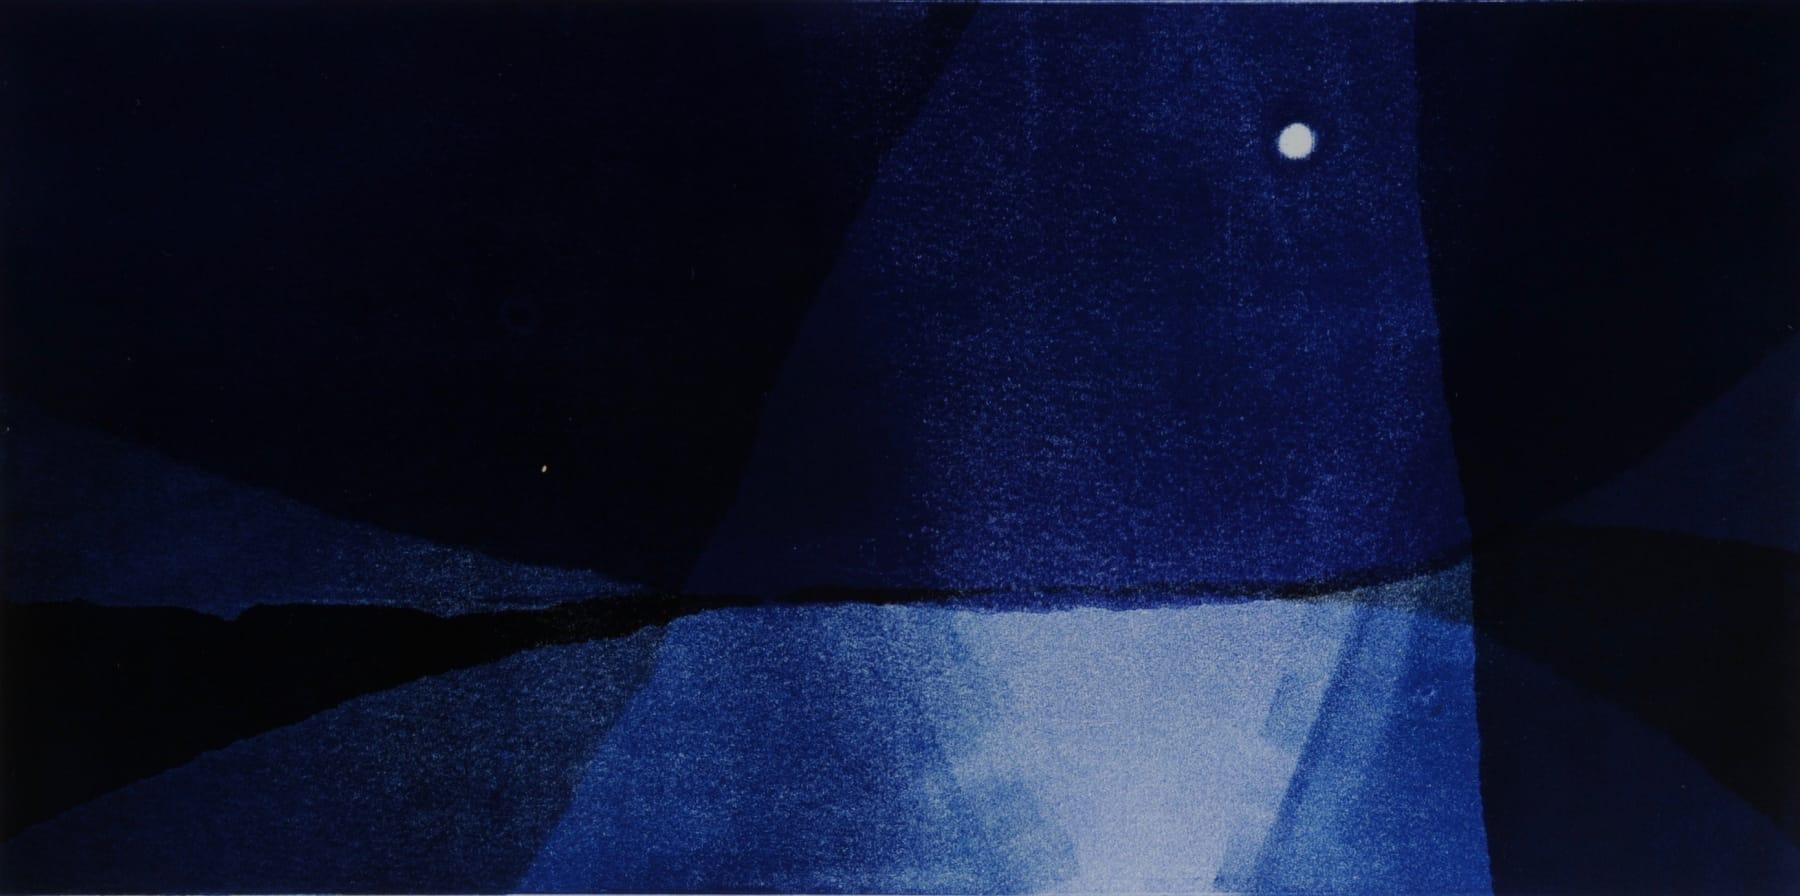 Nigel Swift, Edge of Darkness, 2020